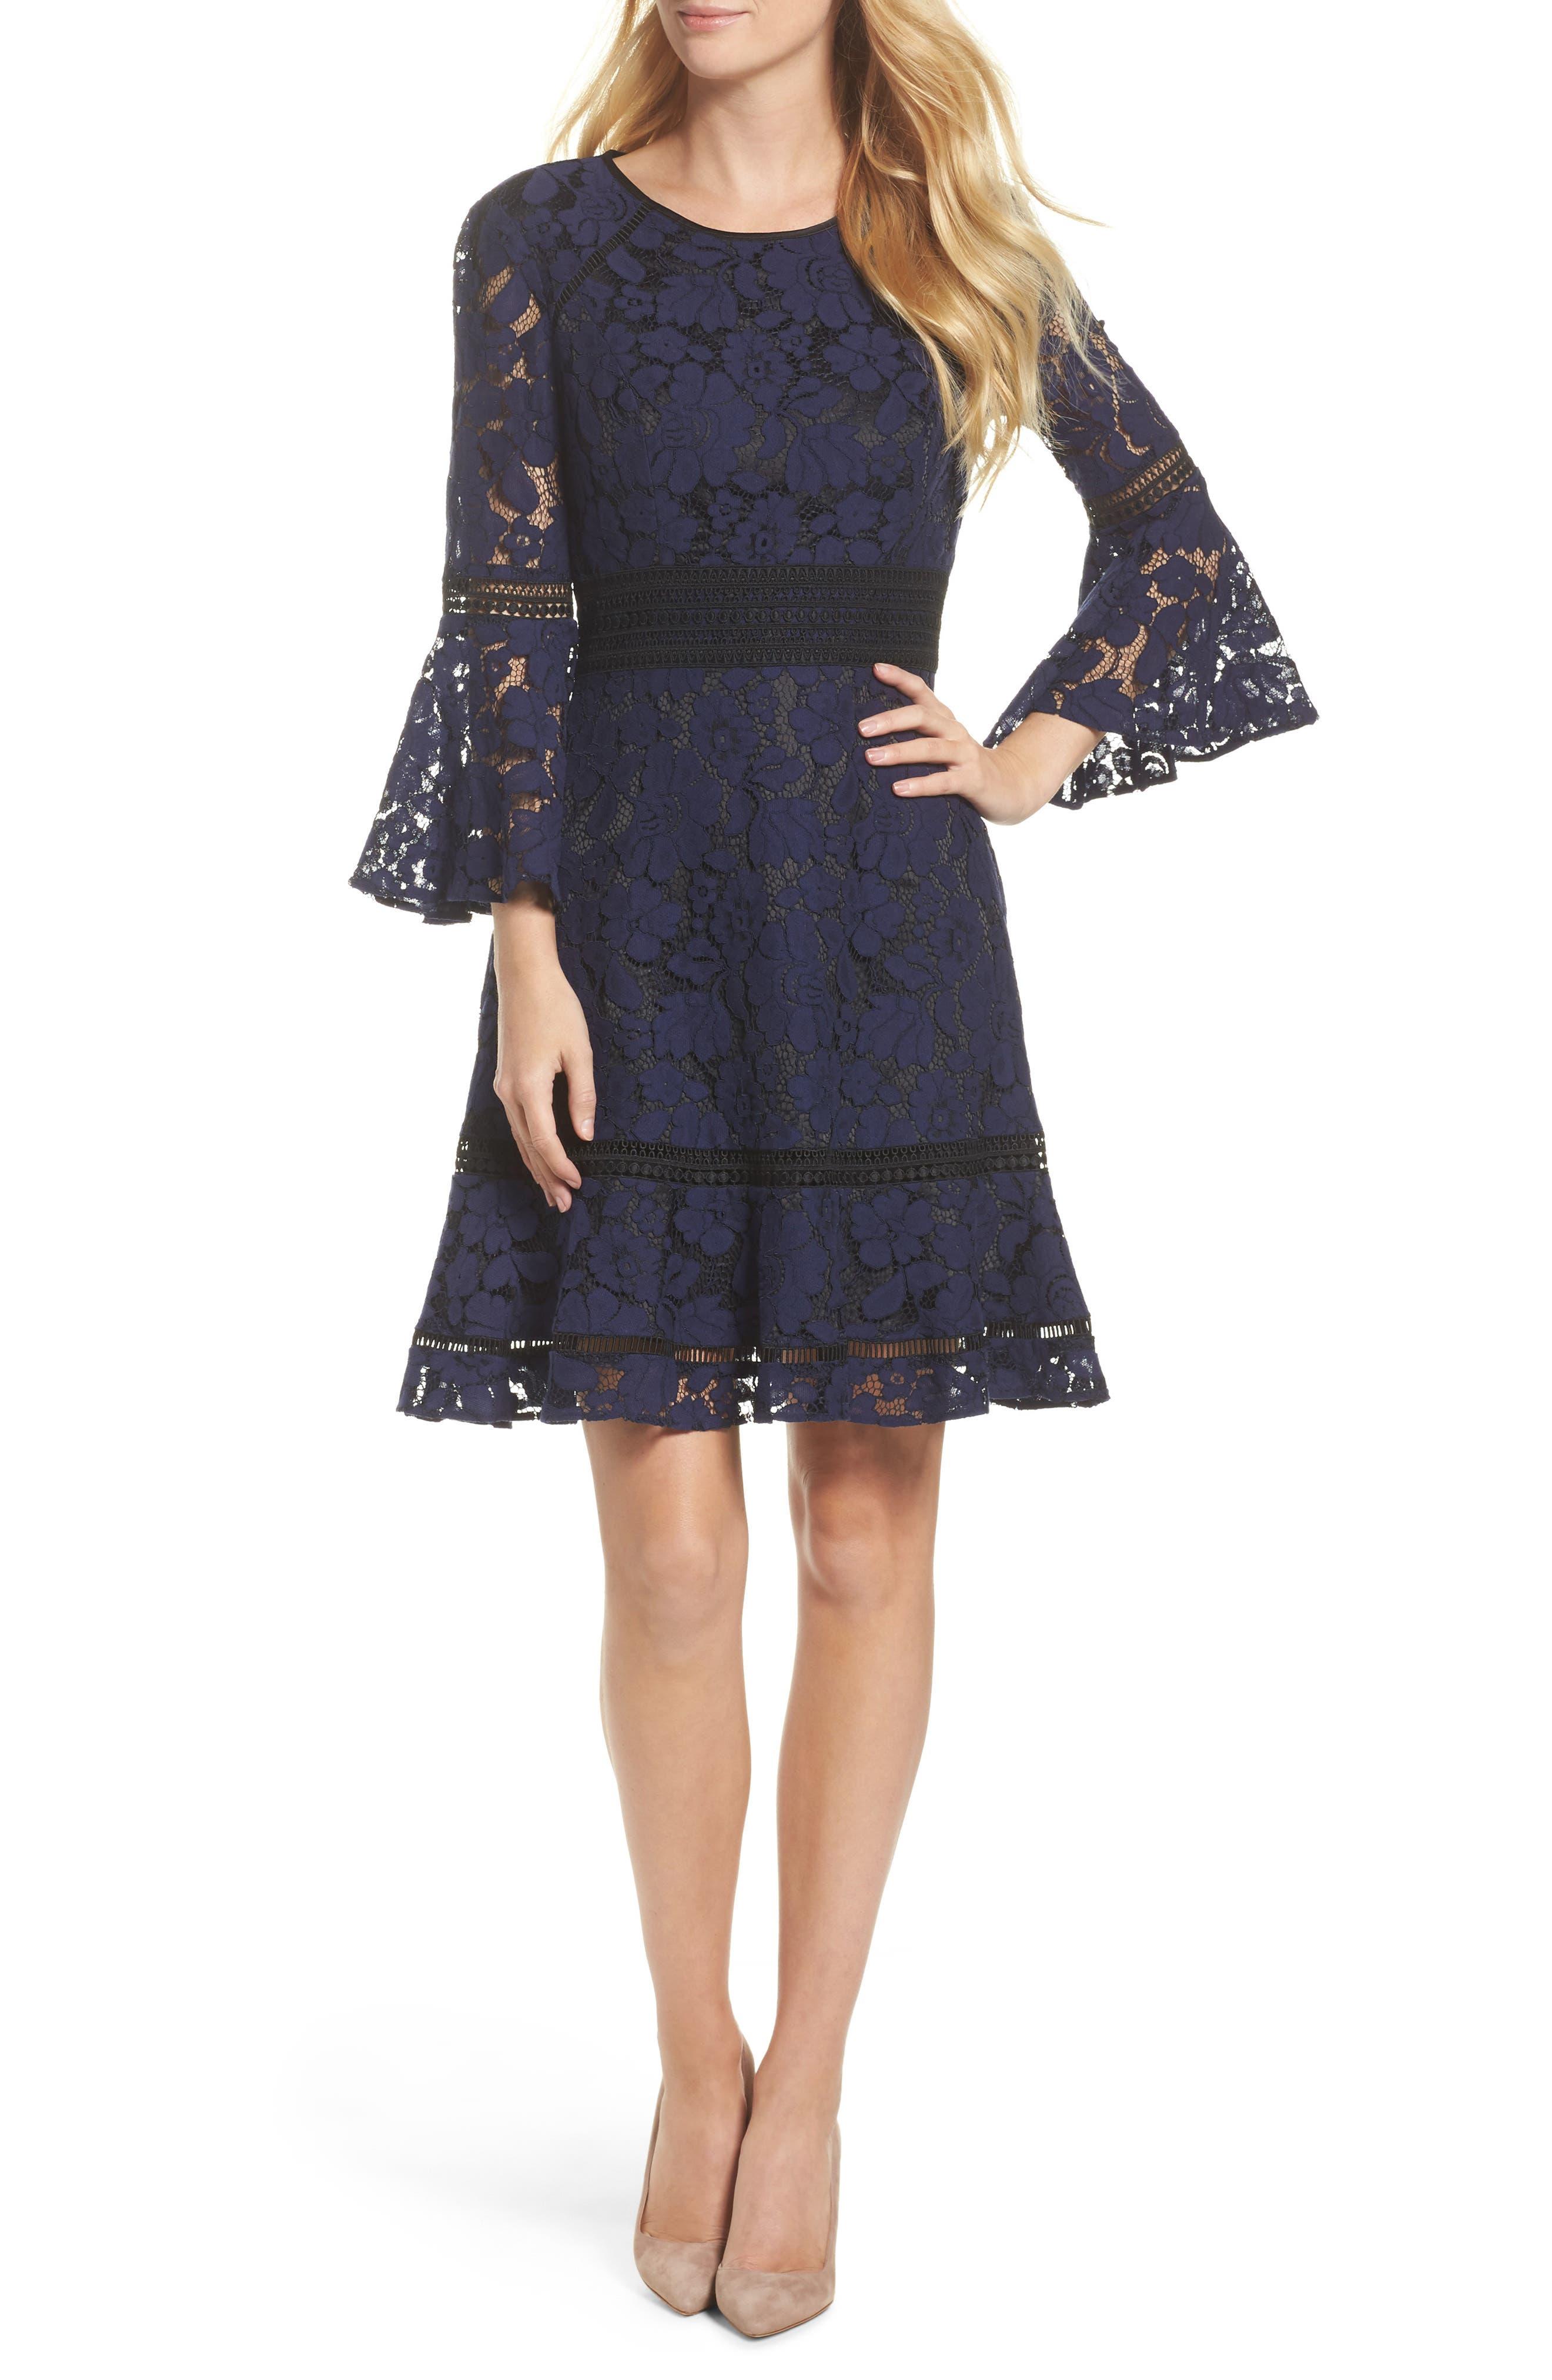 Bell Sleeve Lace Dress,                             Main thumbnail 1, color,                             Navy/ Black